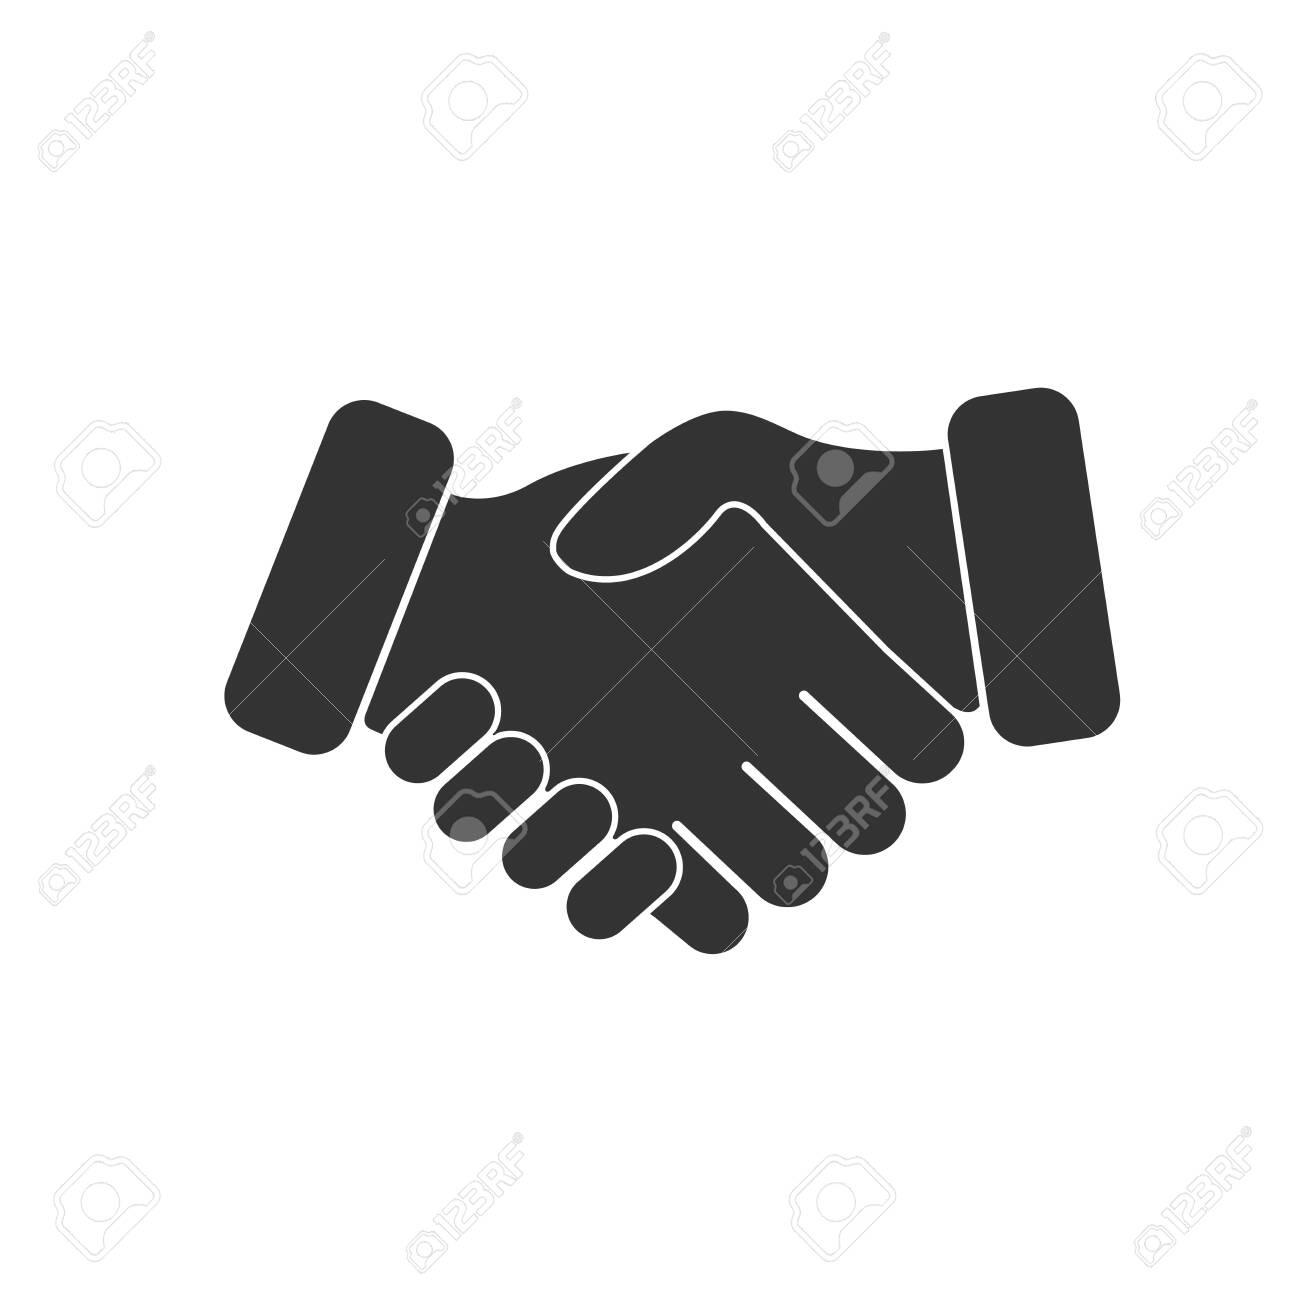 Handshake Friendship Icon Pictogram Symbol - 151412601